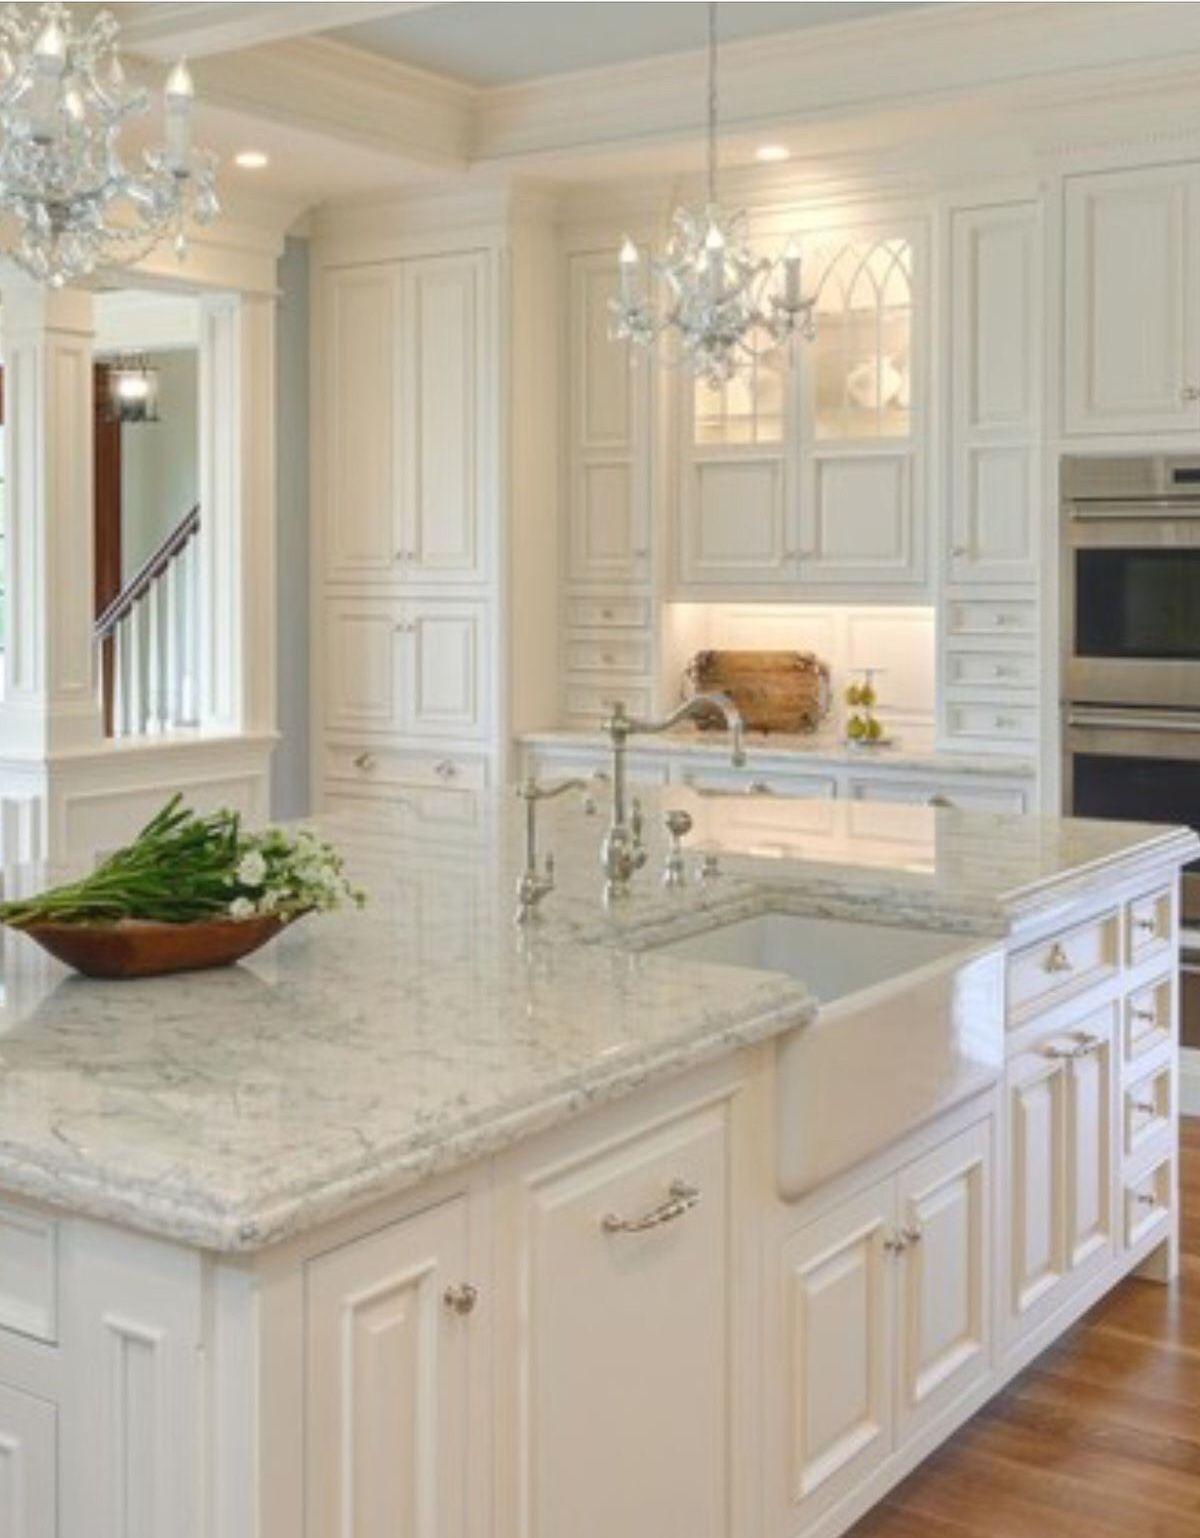 Two window kitchen design  pin by linda chagnon on maison  pinterest  kitchens beautiful